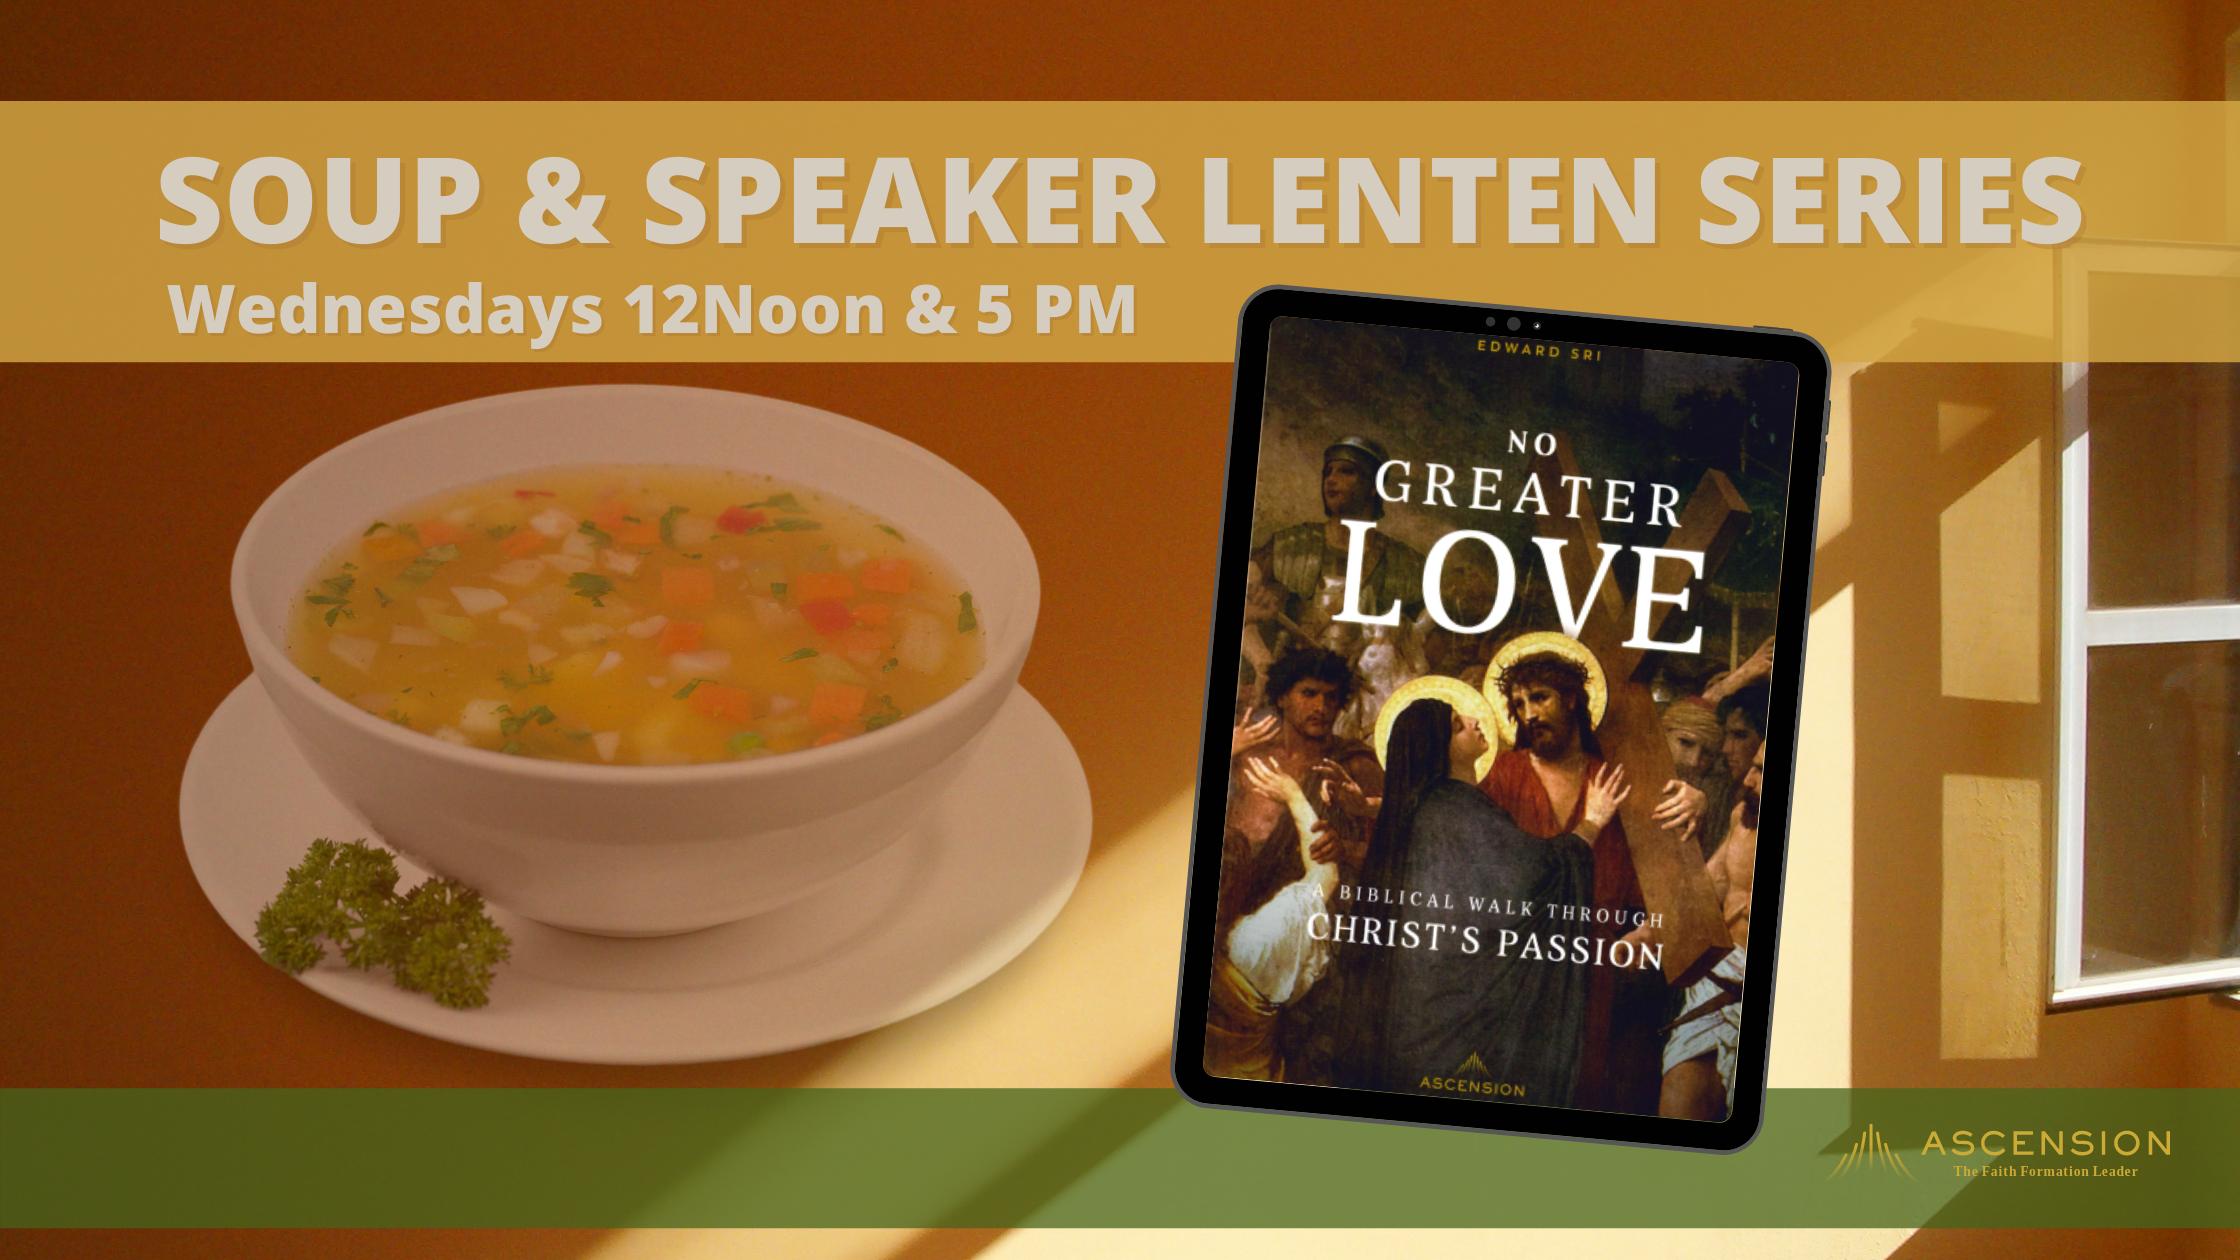 nogreaterlove-soup and speaker